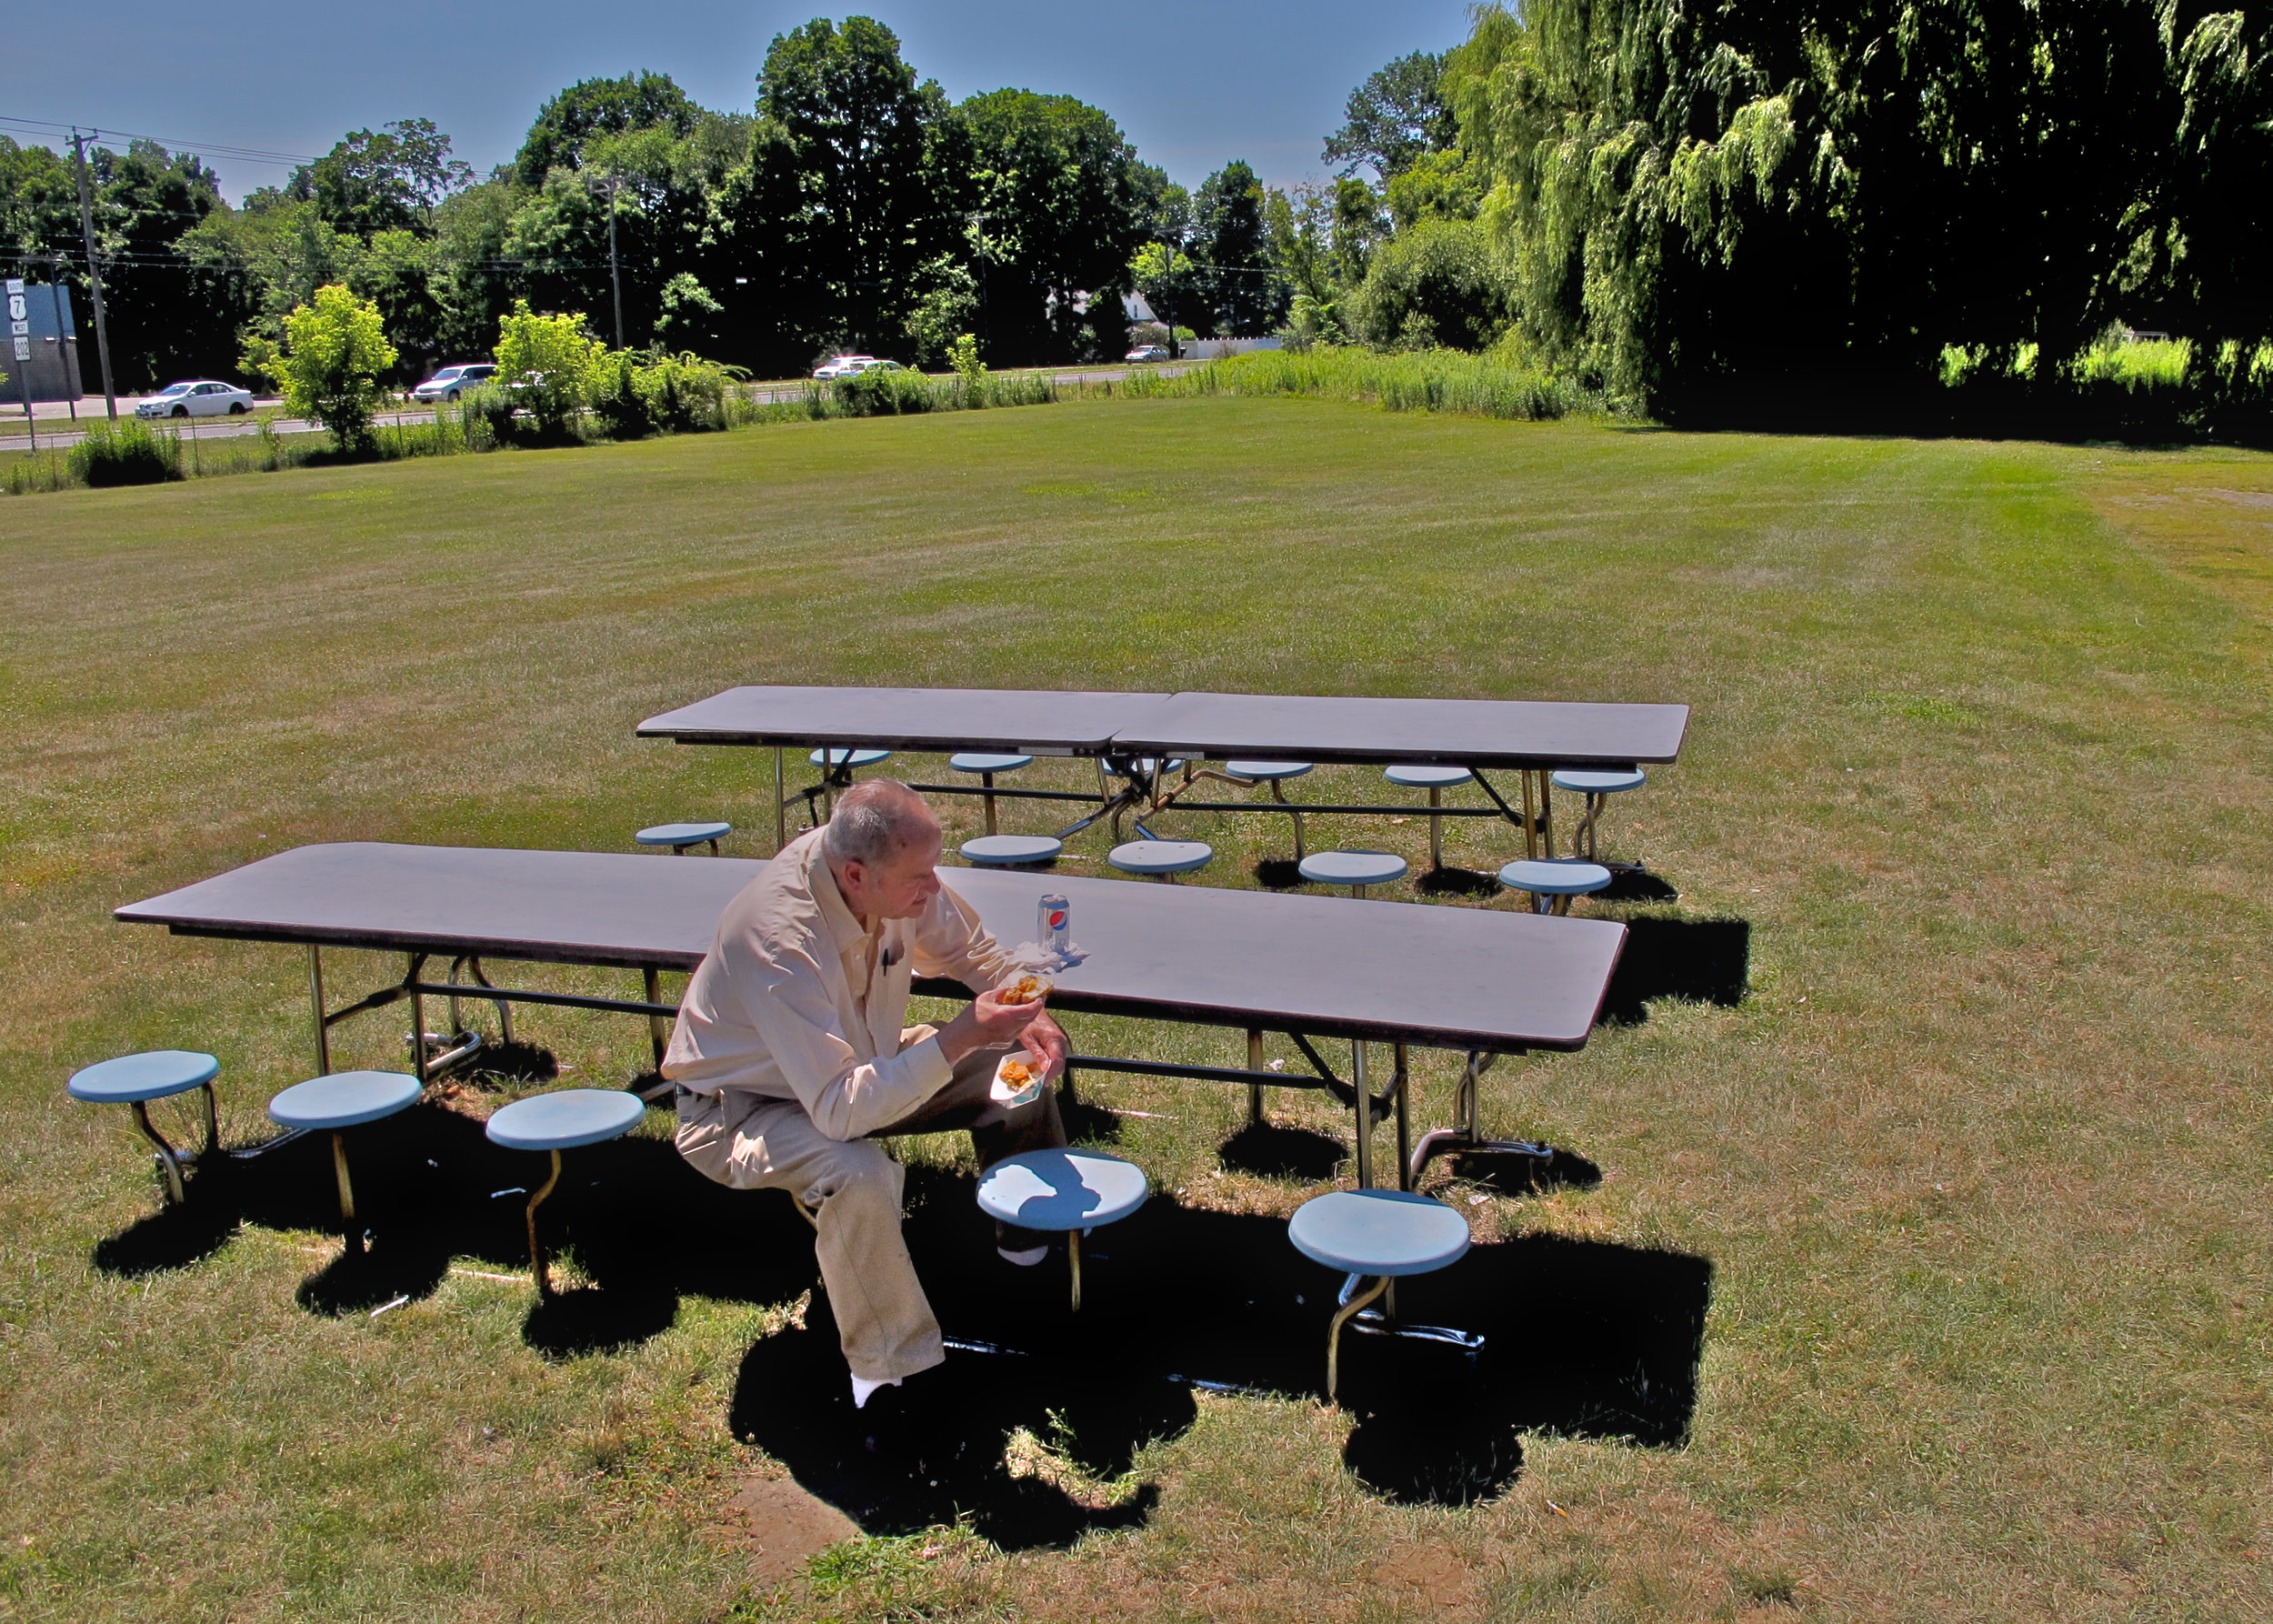 Man with Lunch-Alone��©Richard Frank (1).jpg